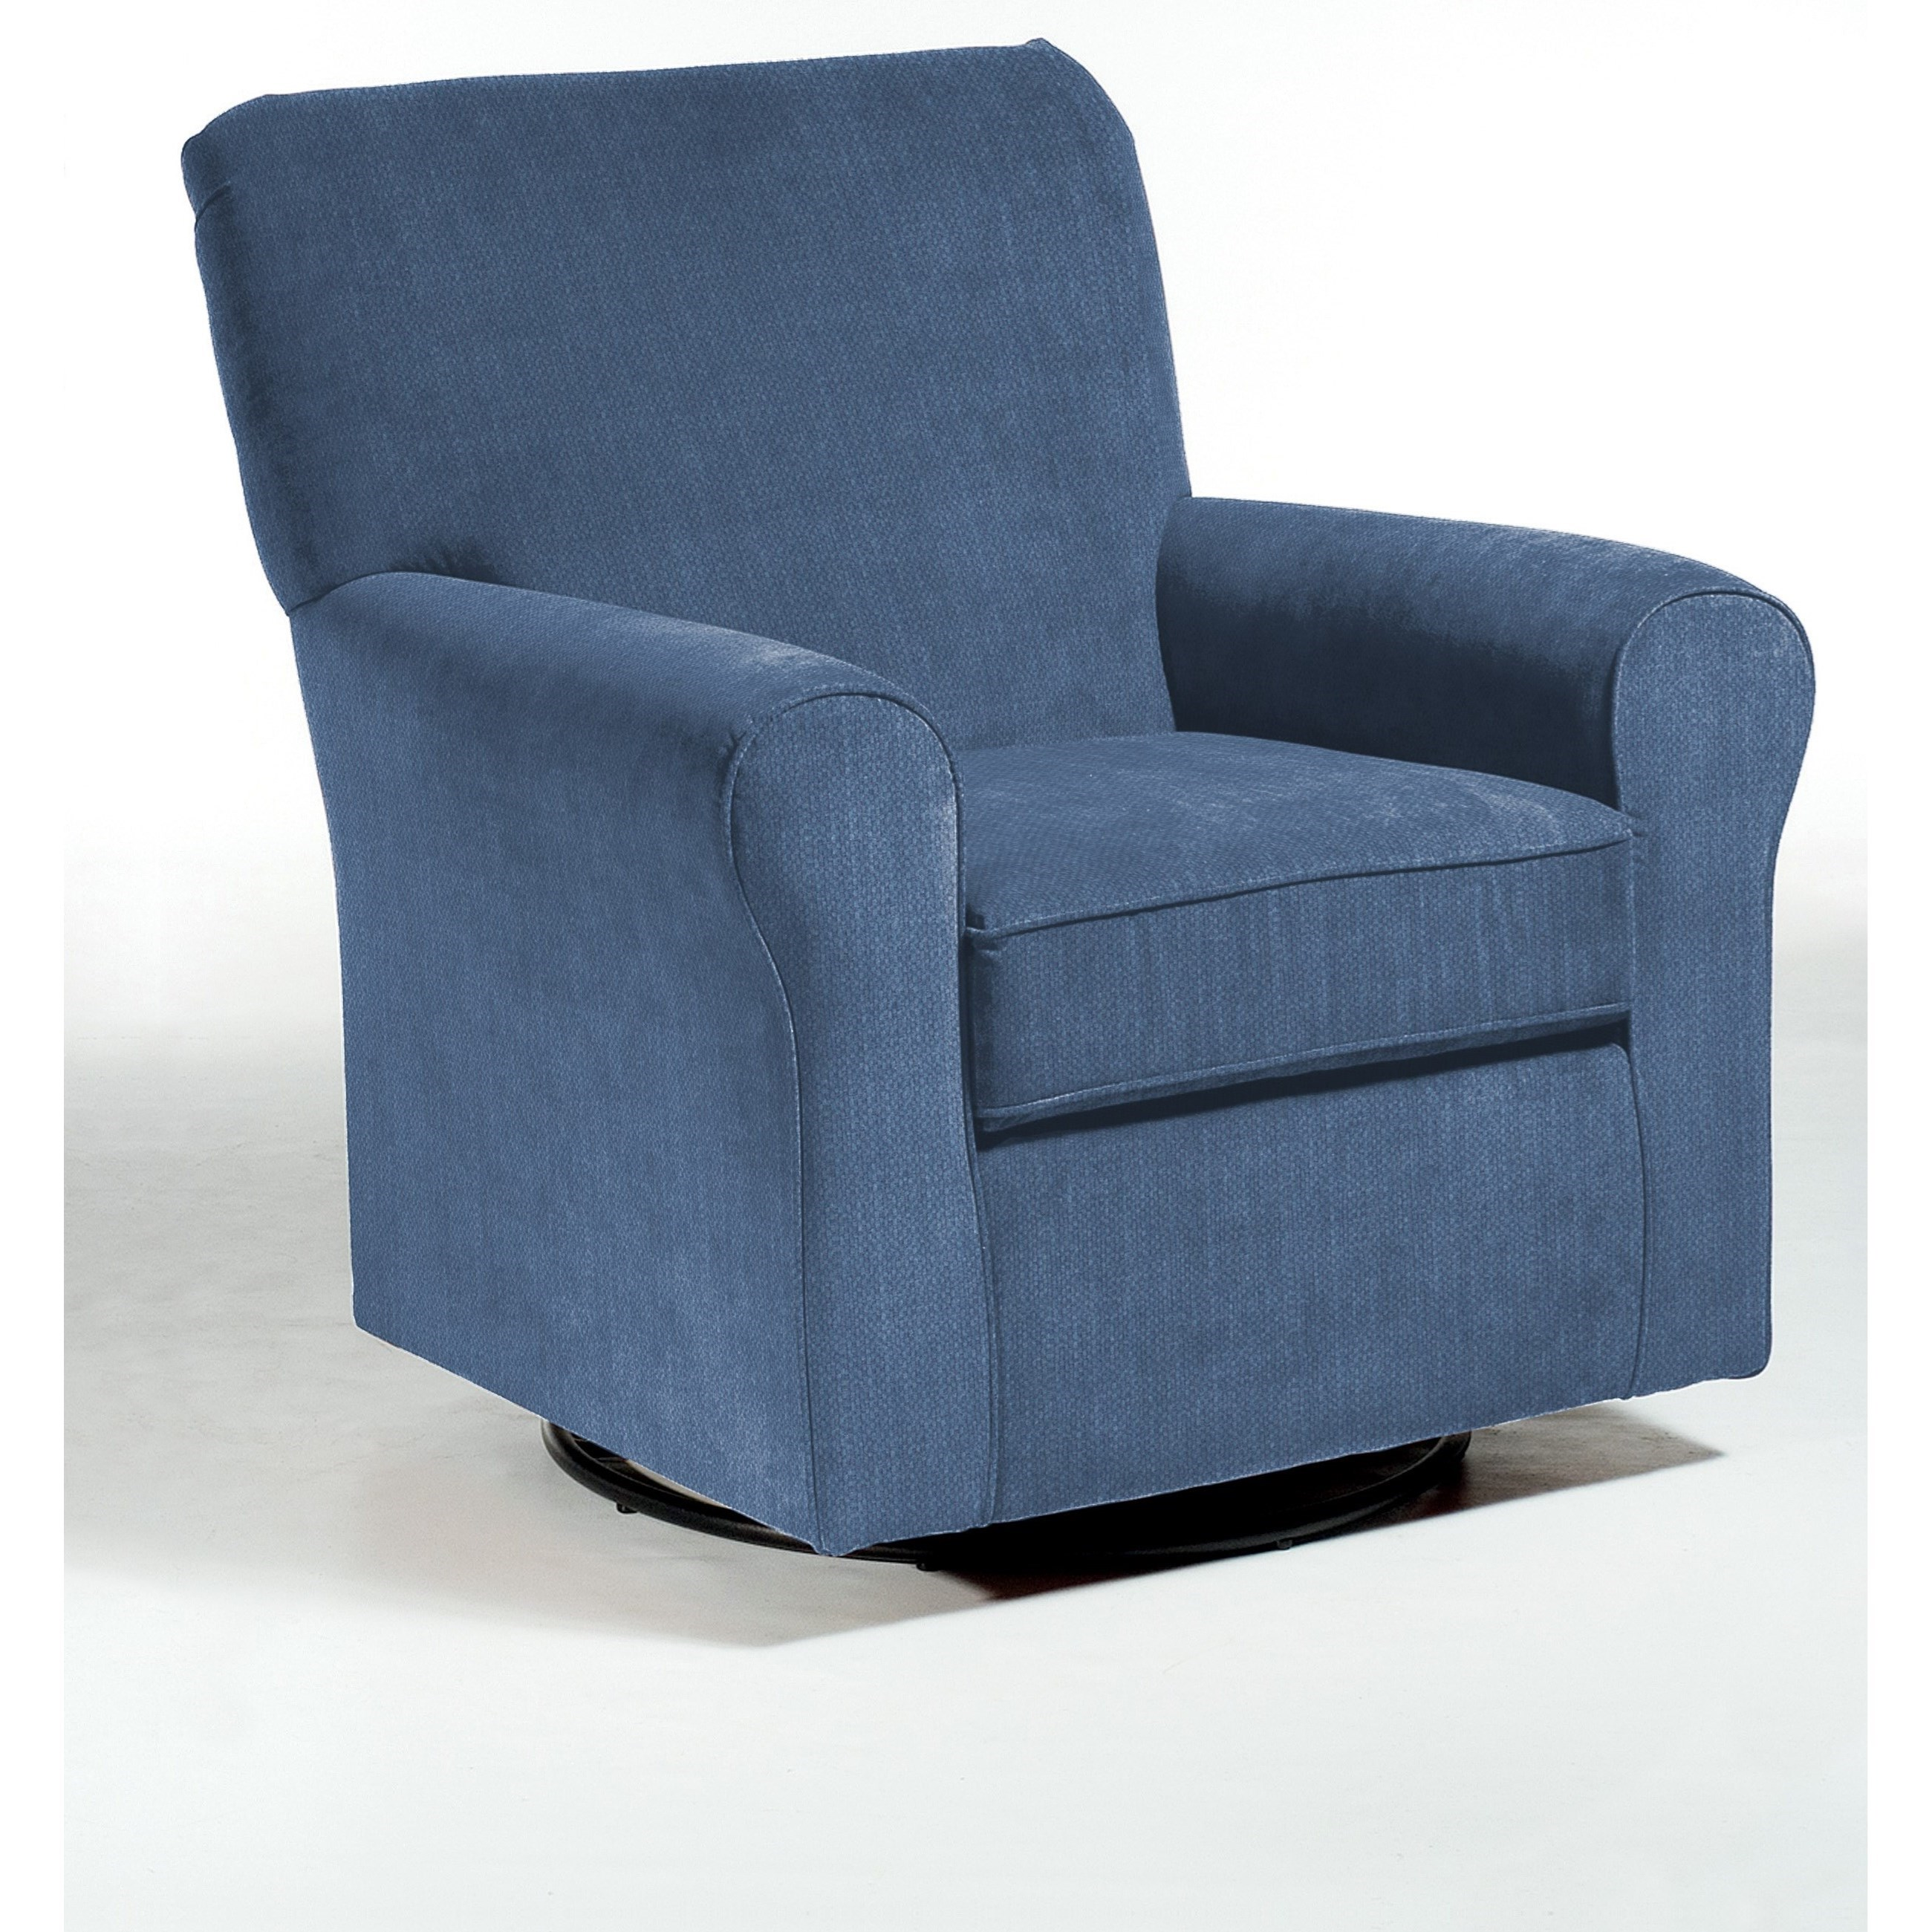 swivel upholstered chairs clear desk best home furnishings glide hagen